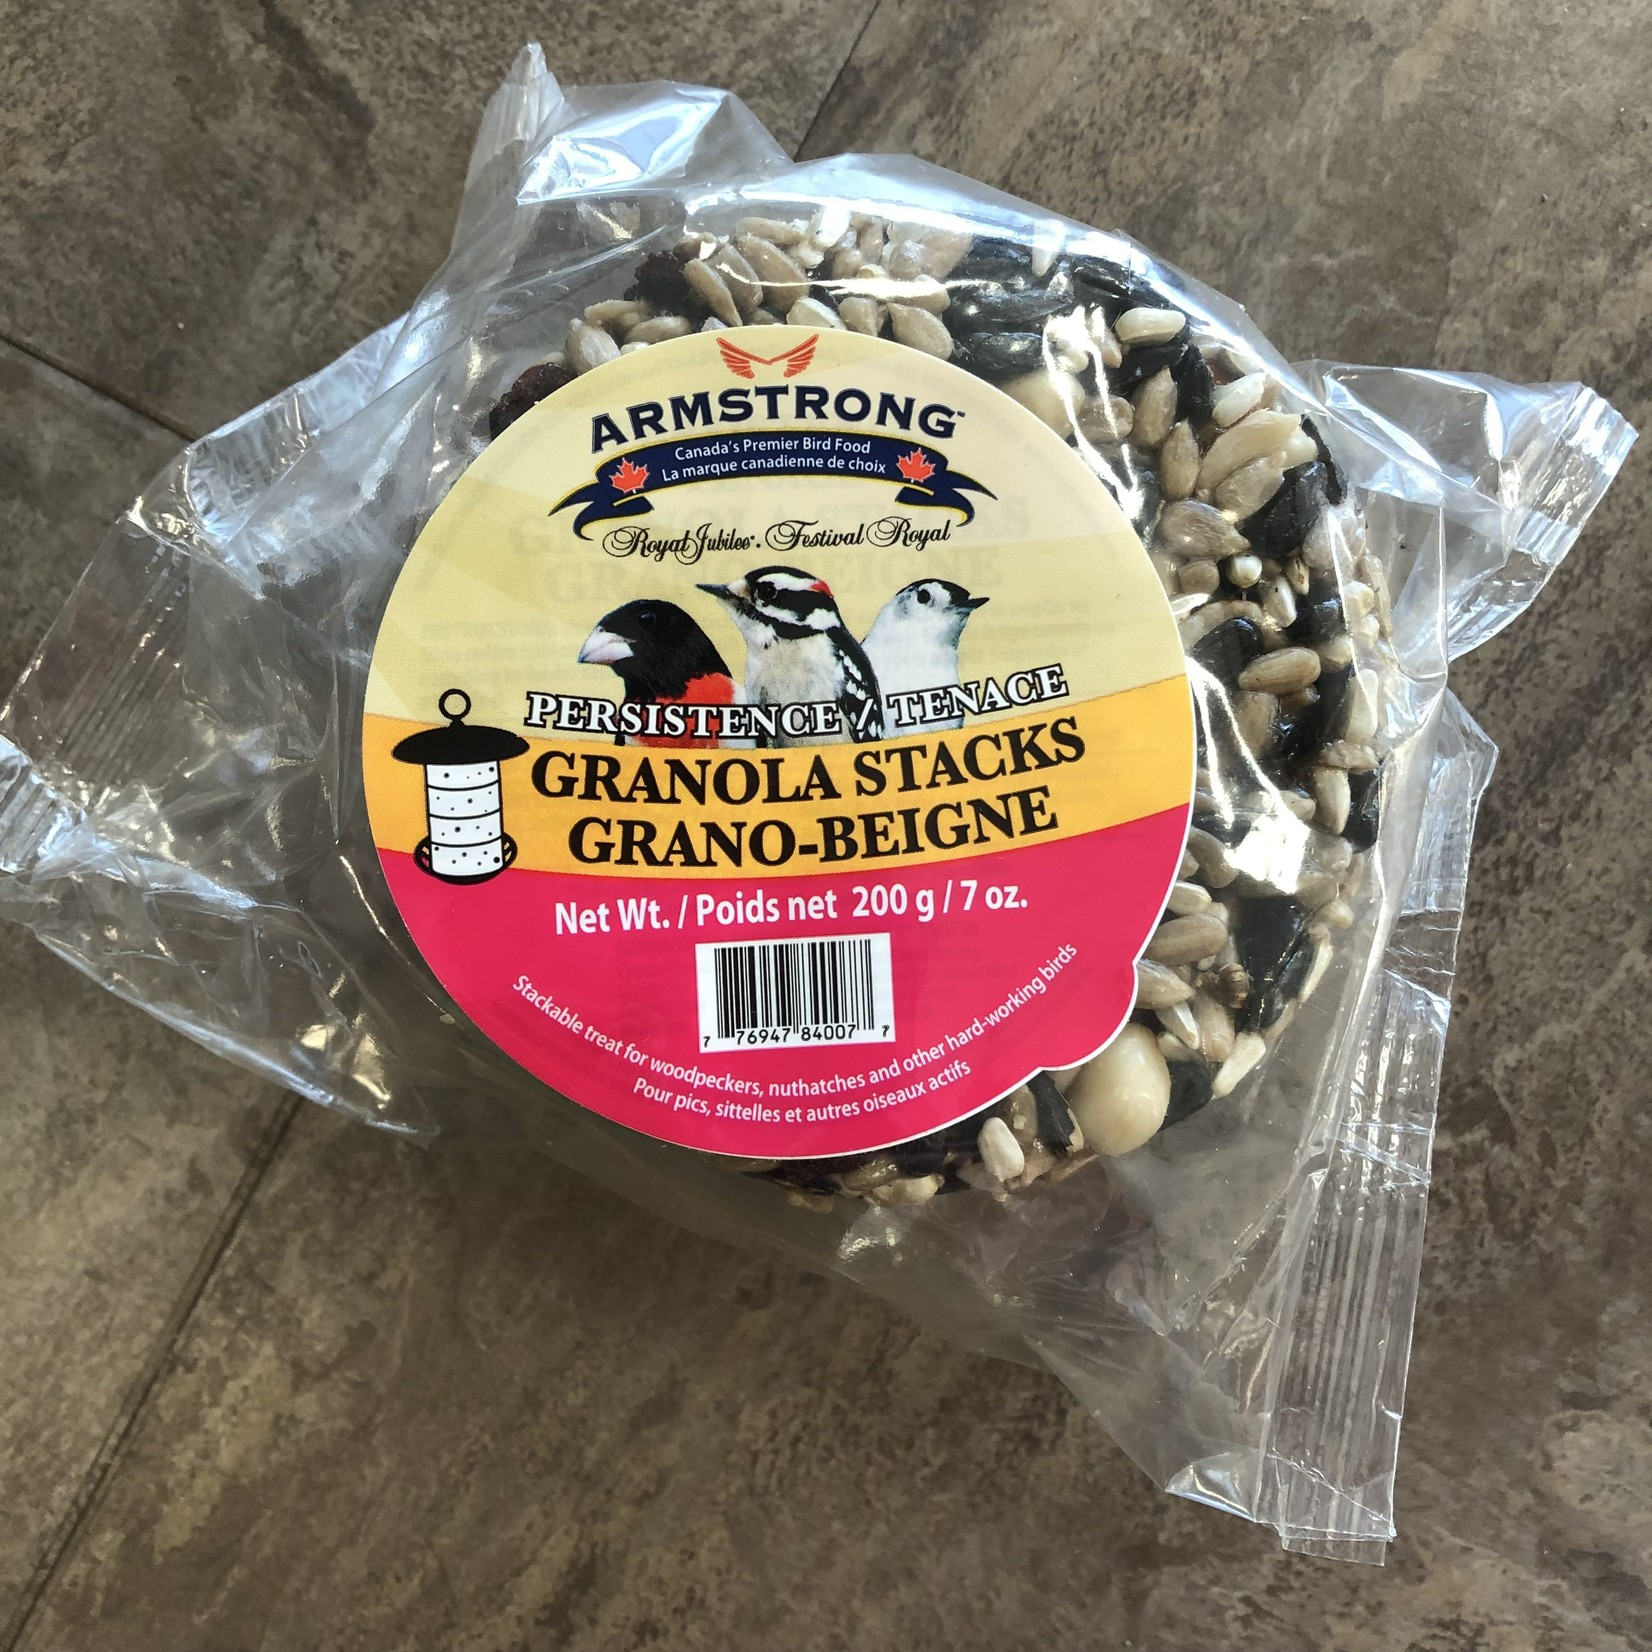 Persistence Granola Stacks